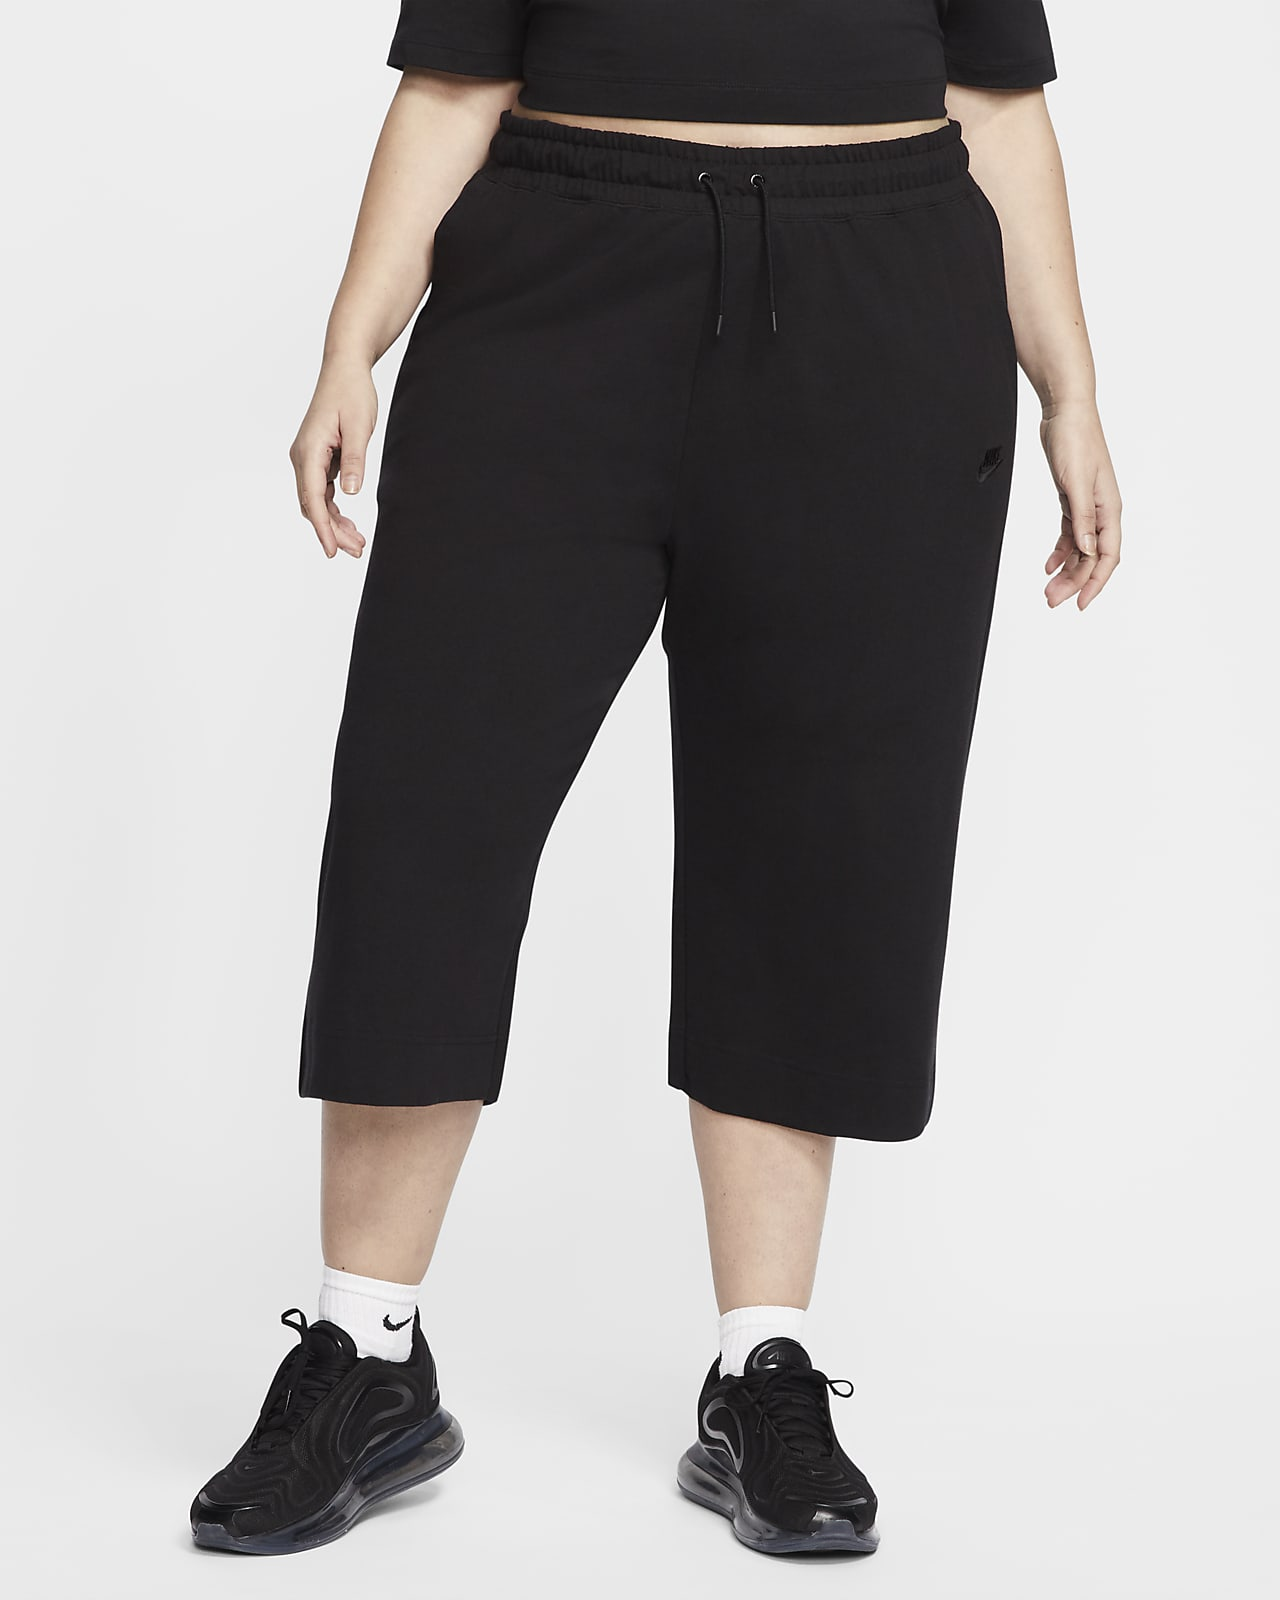 Nike Sportswear capribukser i jersey til dame (store størrelser)